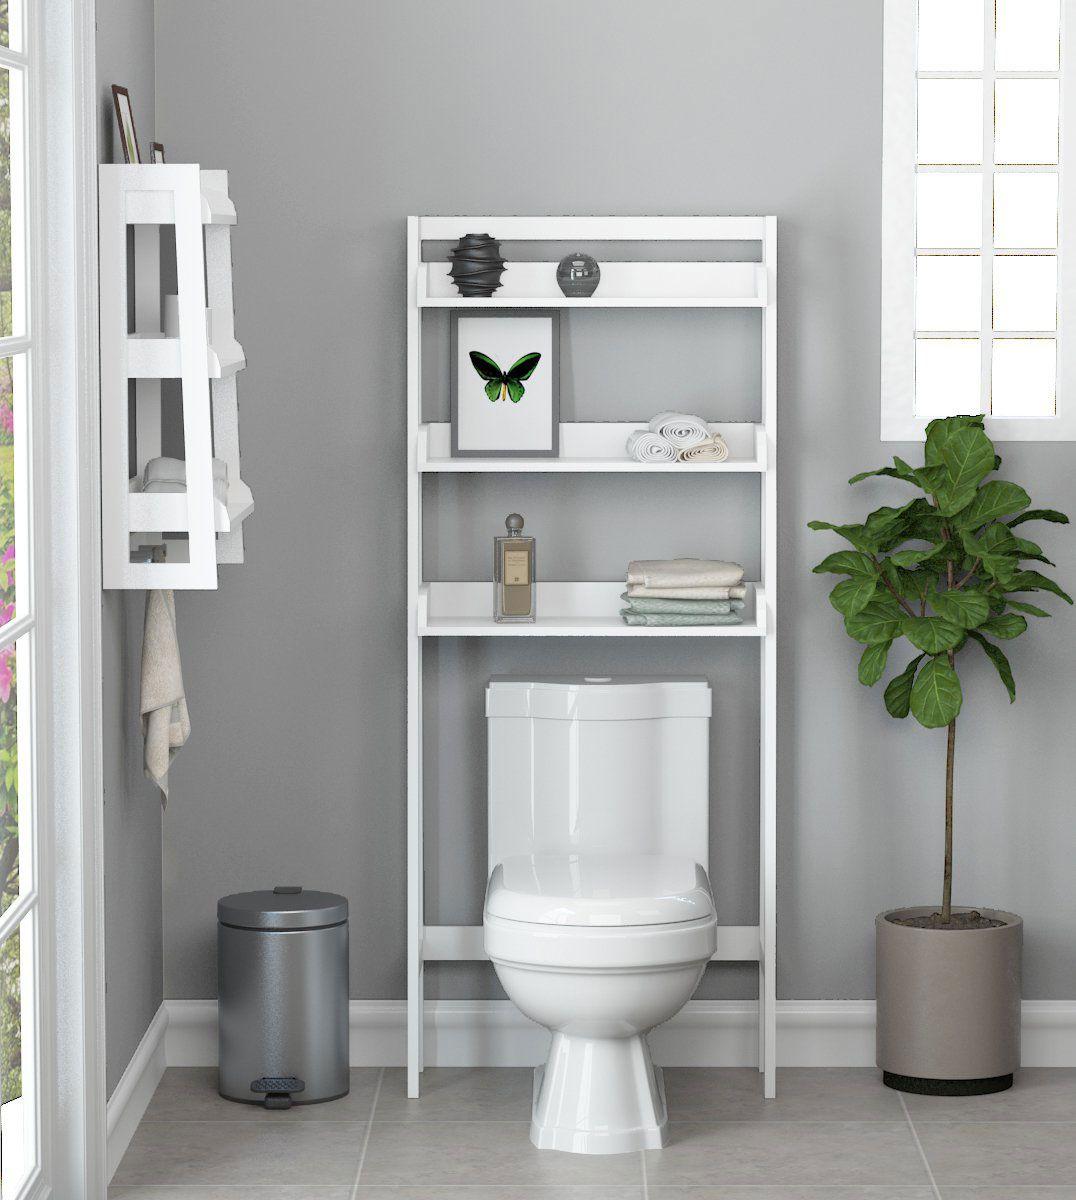 5 Best Over-the-Toilet Storage Ideas on Amazon — 2019